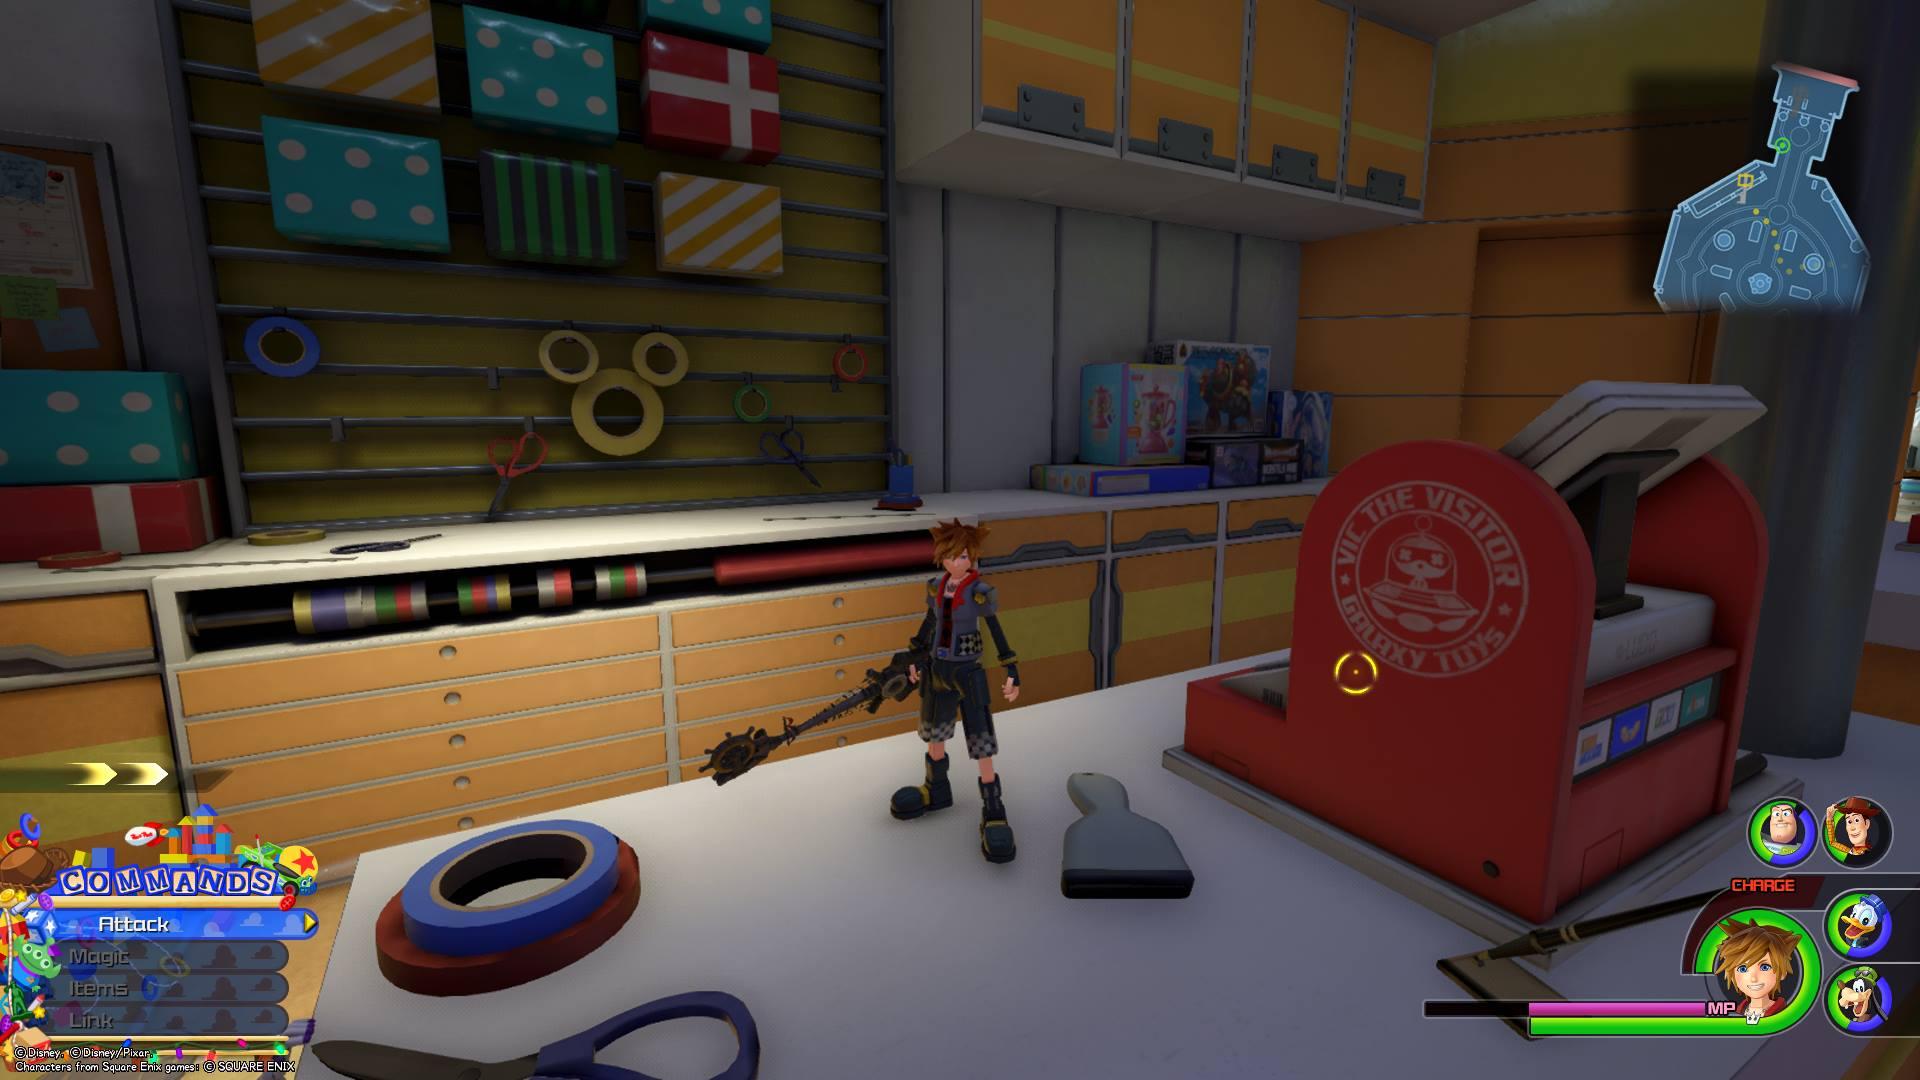 Kingdom Hearts 3 Toy Box Lucky Emblem Locations Superparent